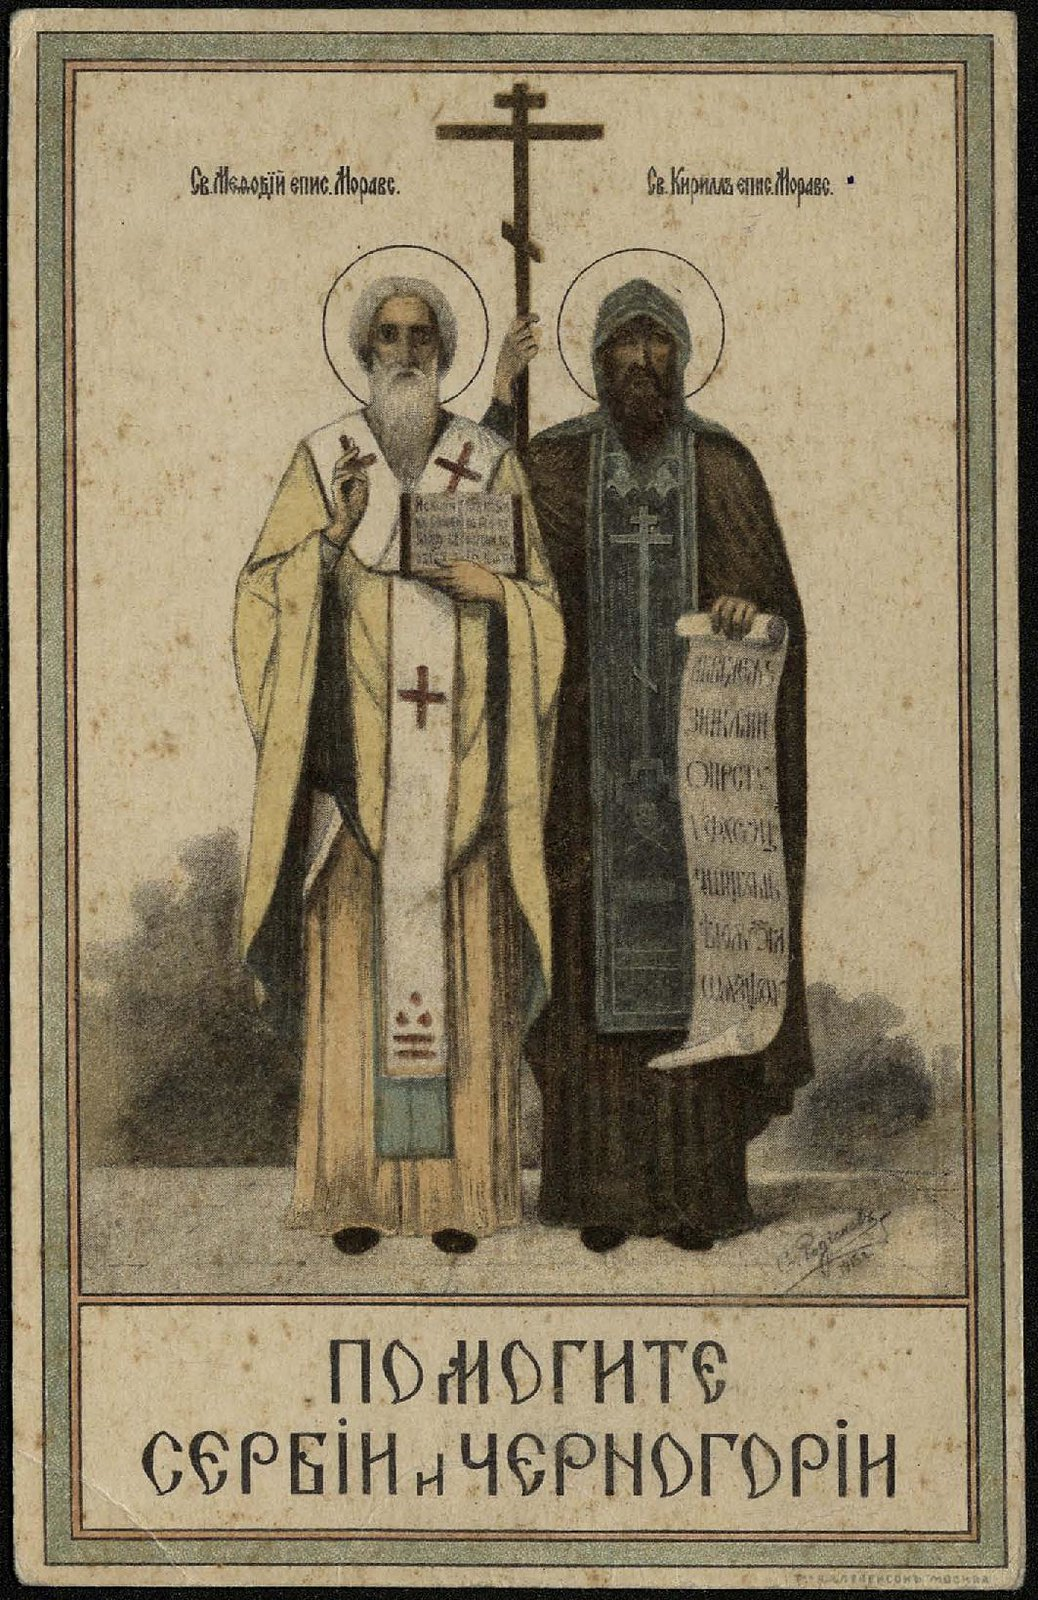 1914. Помогите Сербии и Черногории